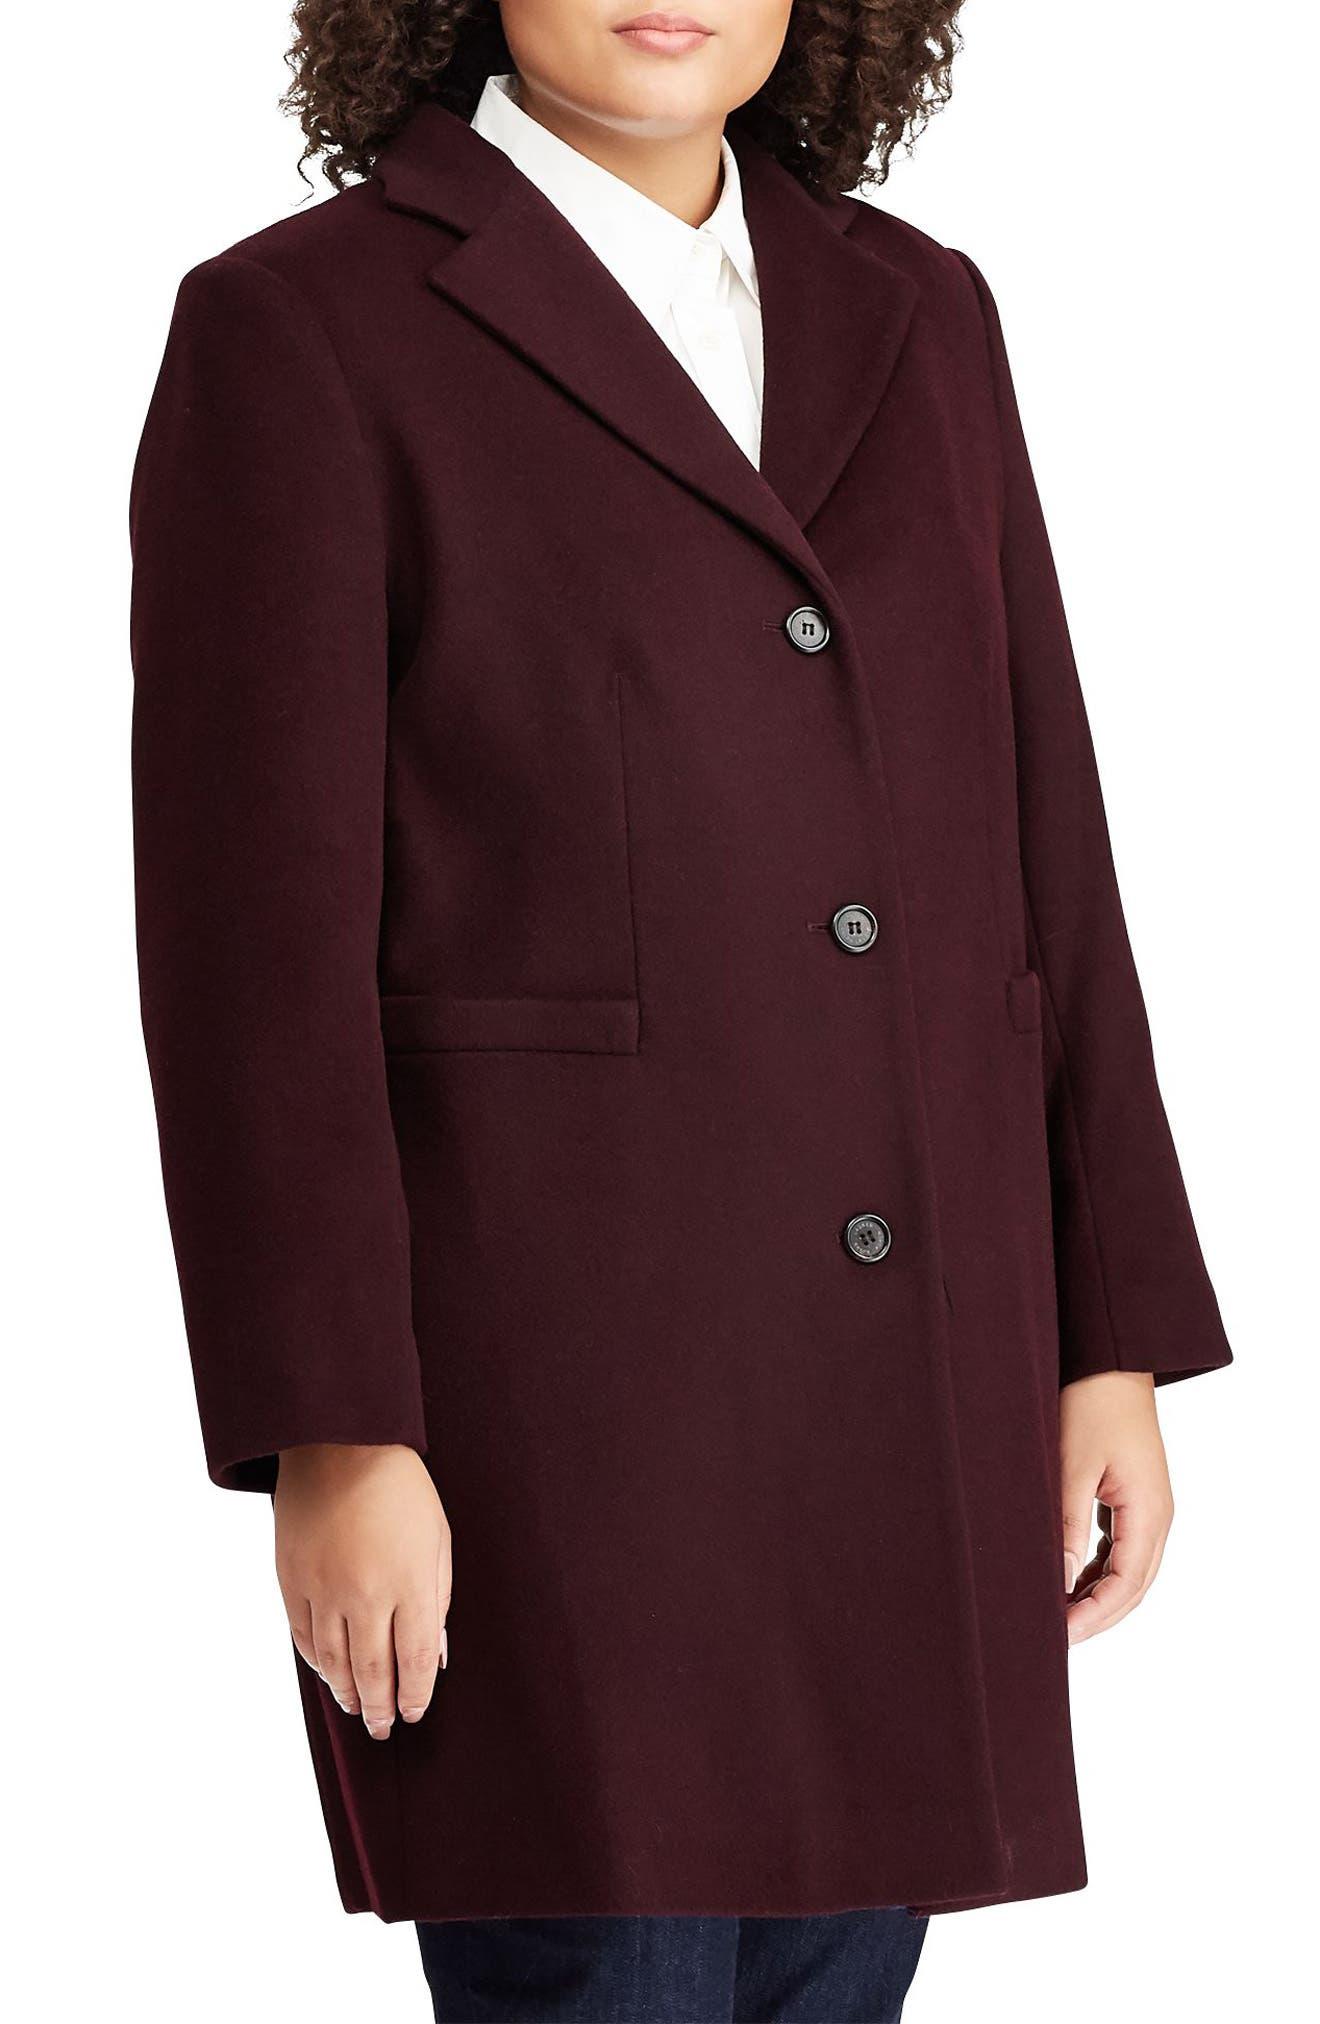 LAUREN RALPH LAUREN,                             Wool Blend Reefer Coat,                             Main thumbnail 1, color,                             BURGUNDY